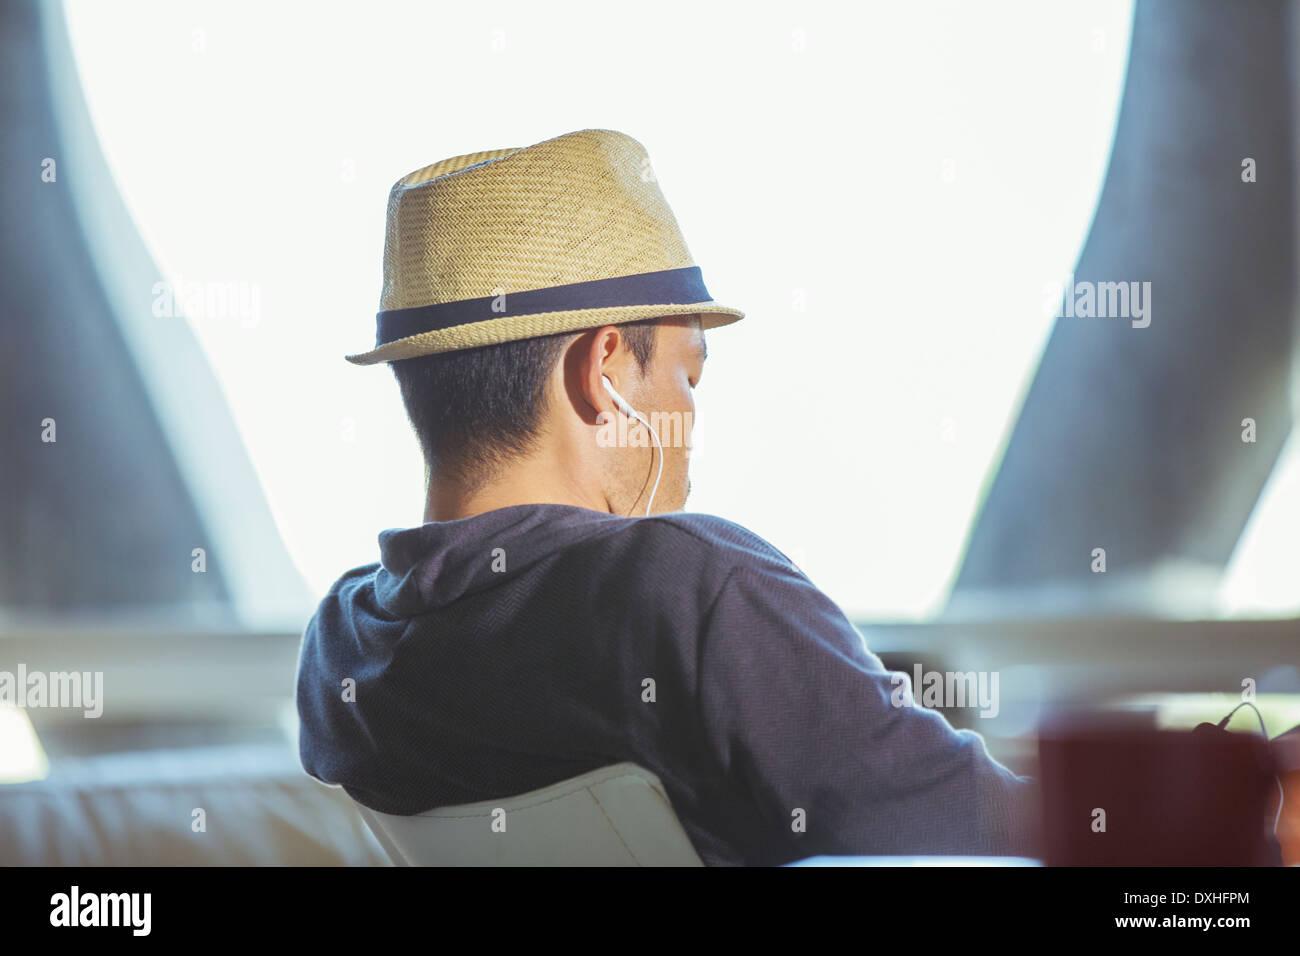 Mann in Fedora mit Kopfhörern Stockbild